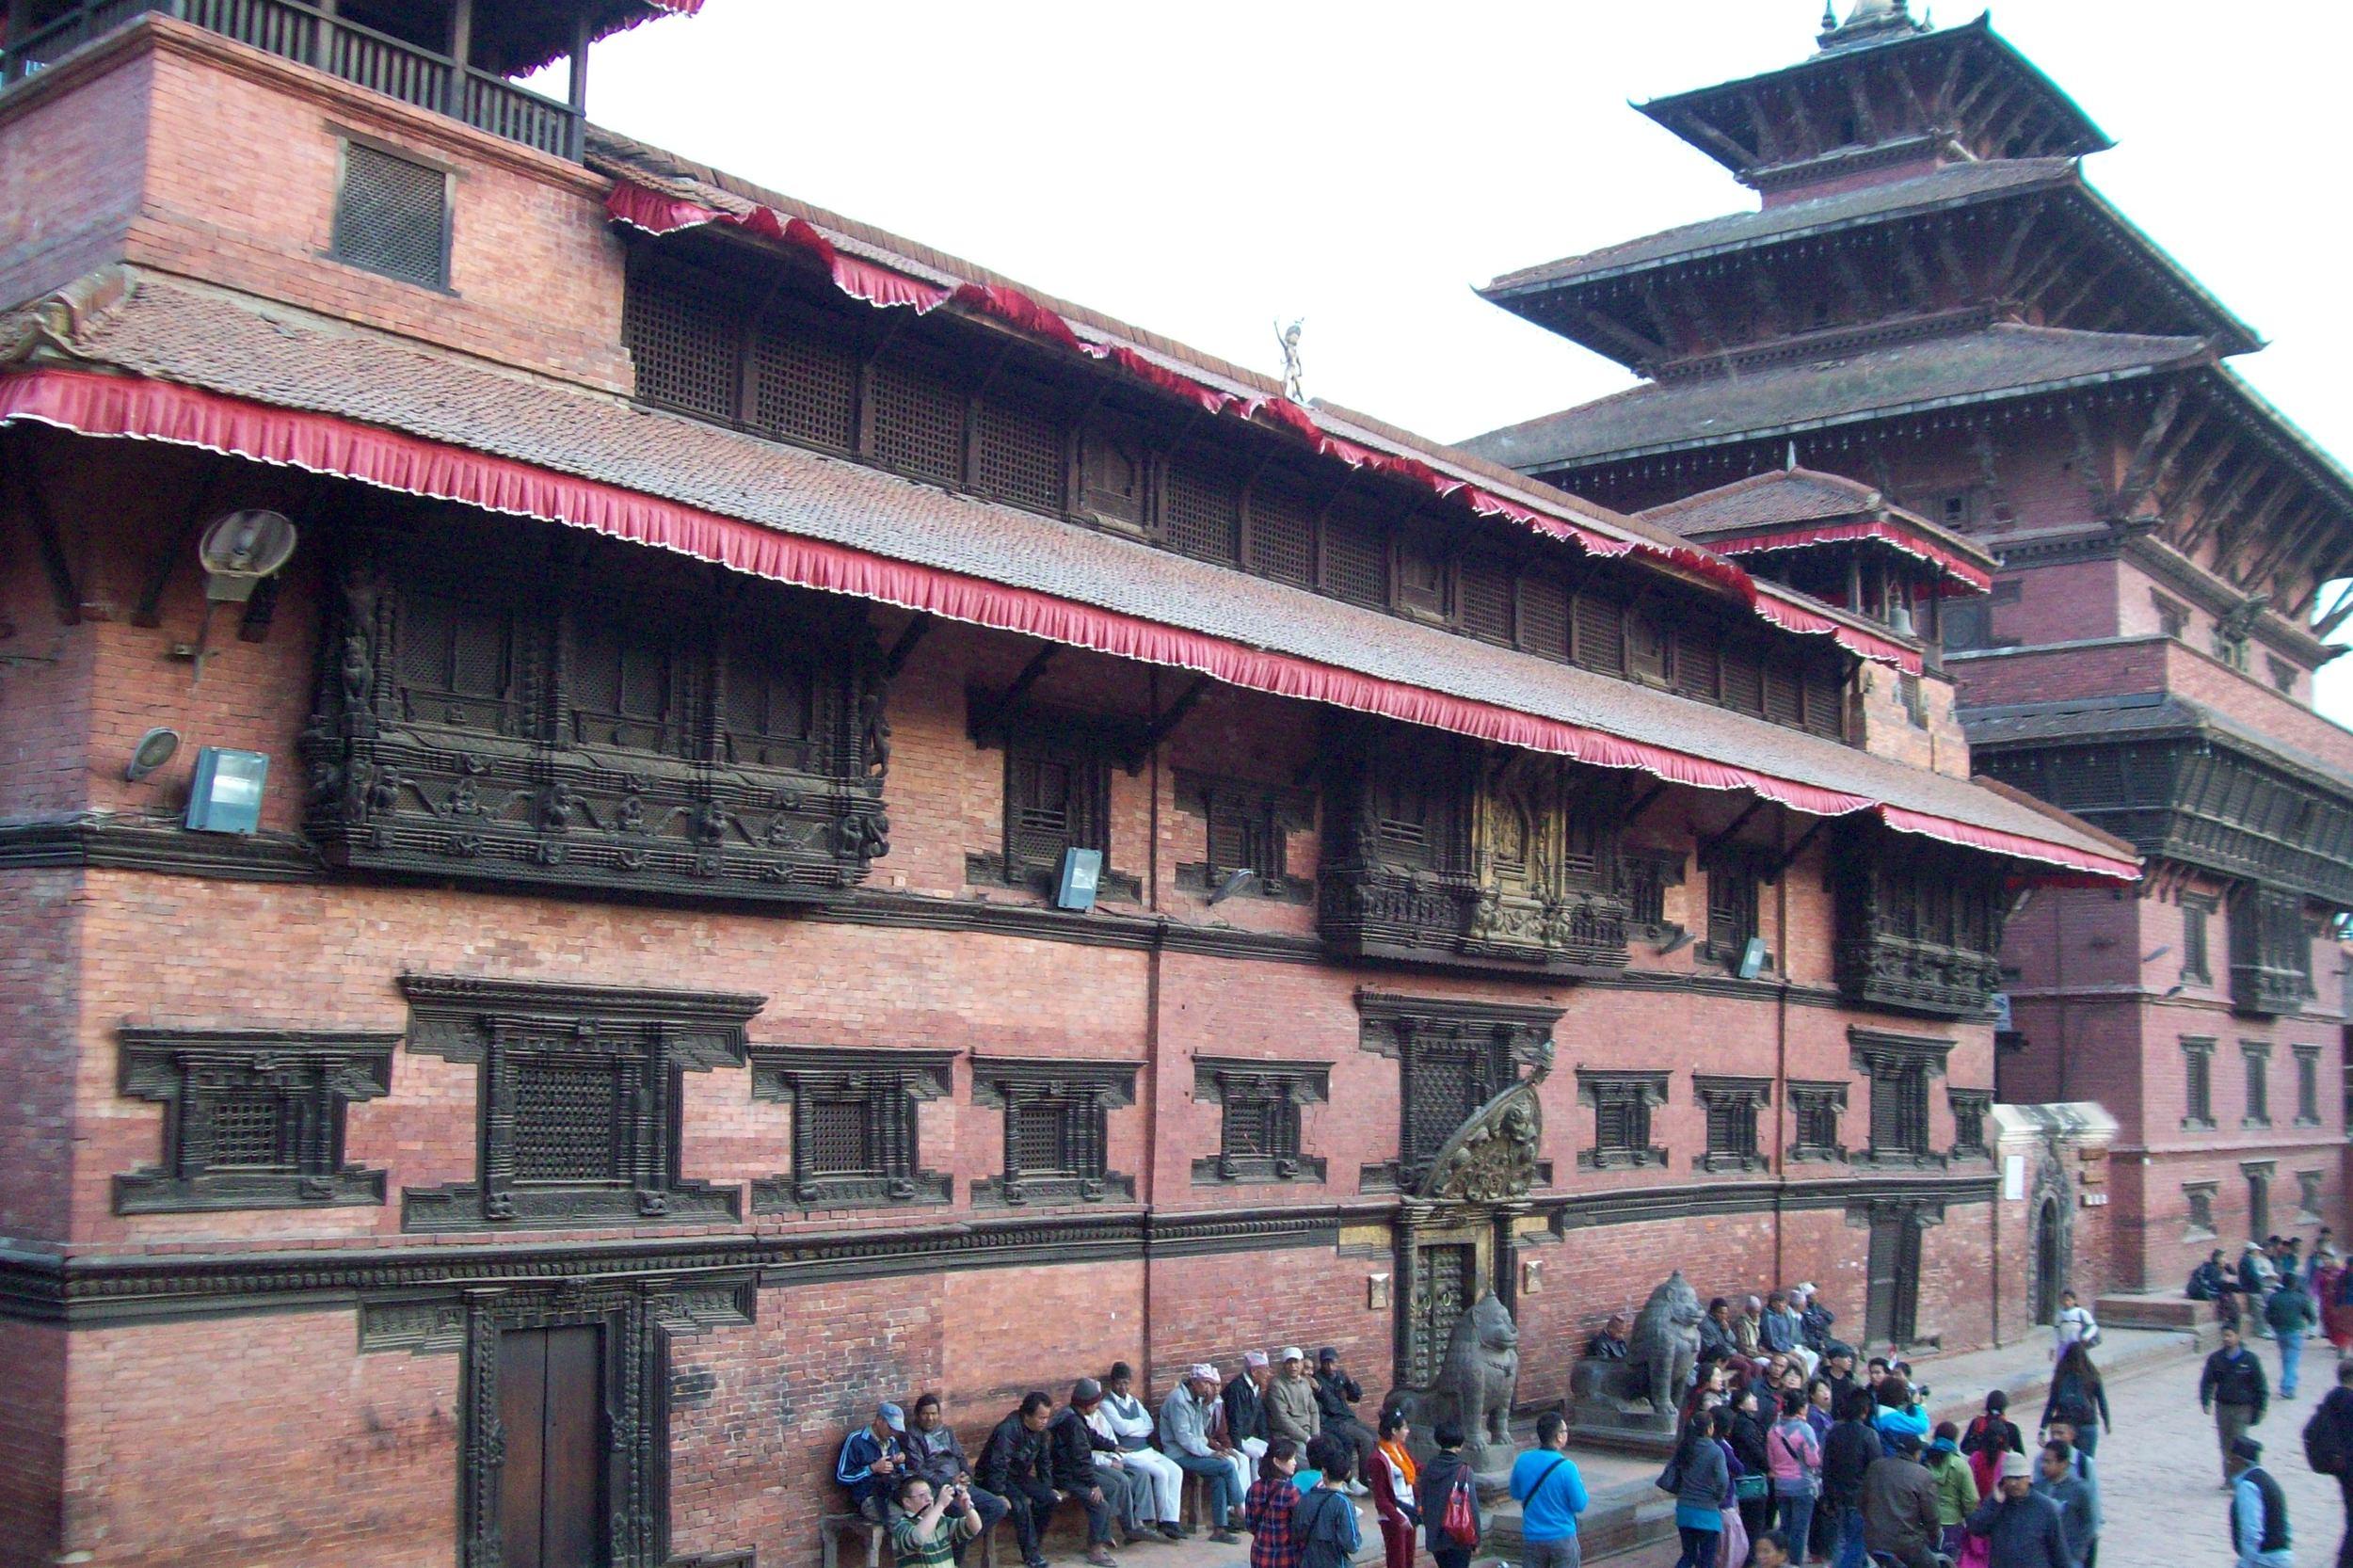 Patan Museum and Royal Palace